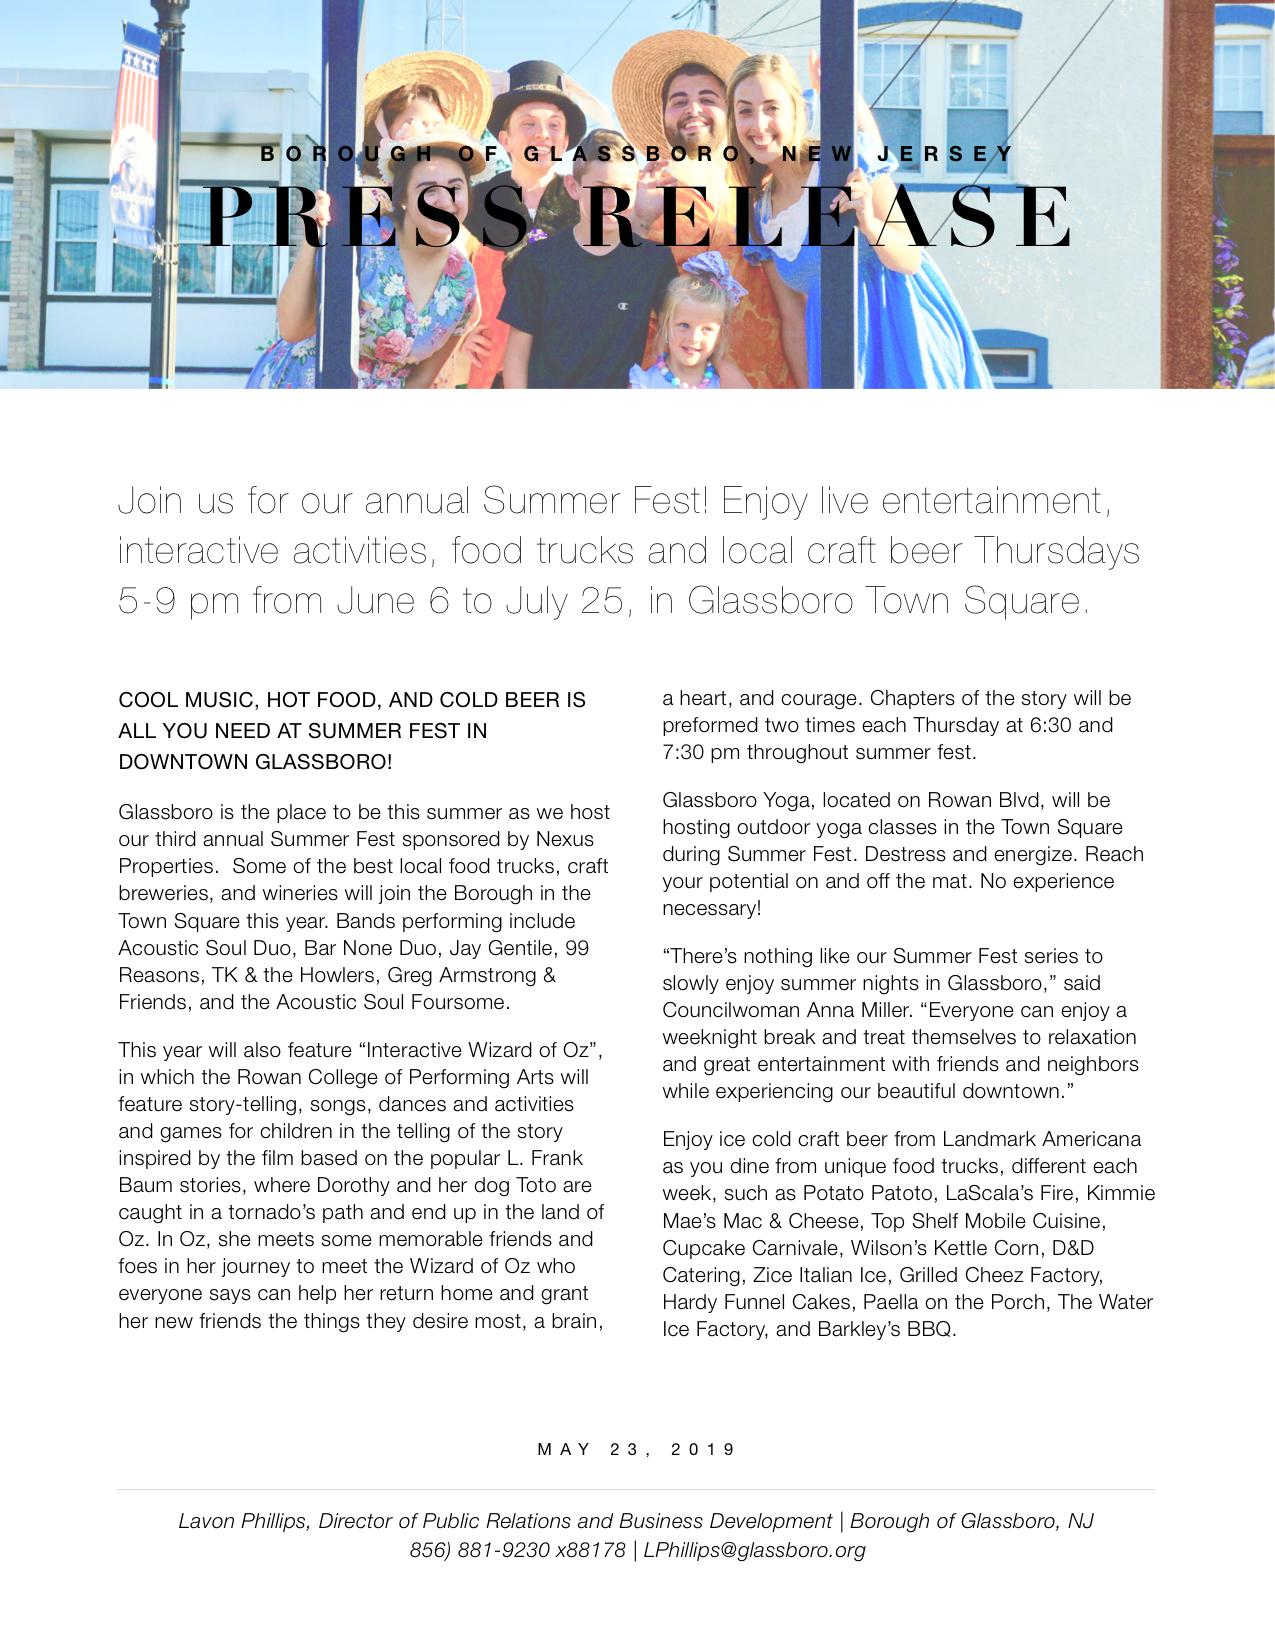 Glassboro NJ Press release SUMMER FEST 2019.jpeg